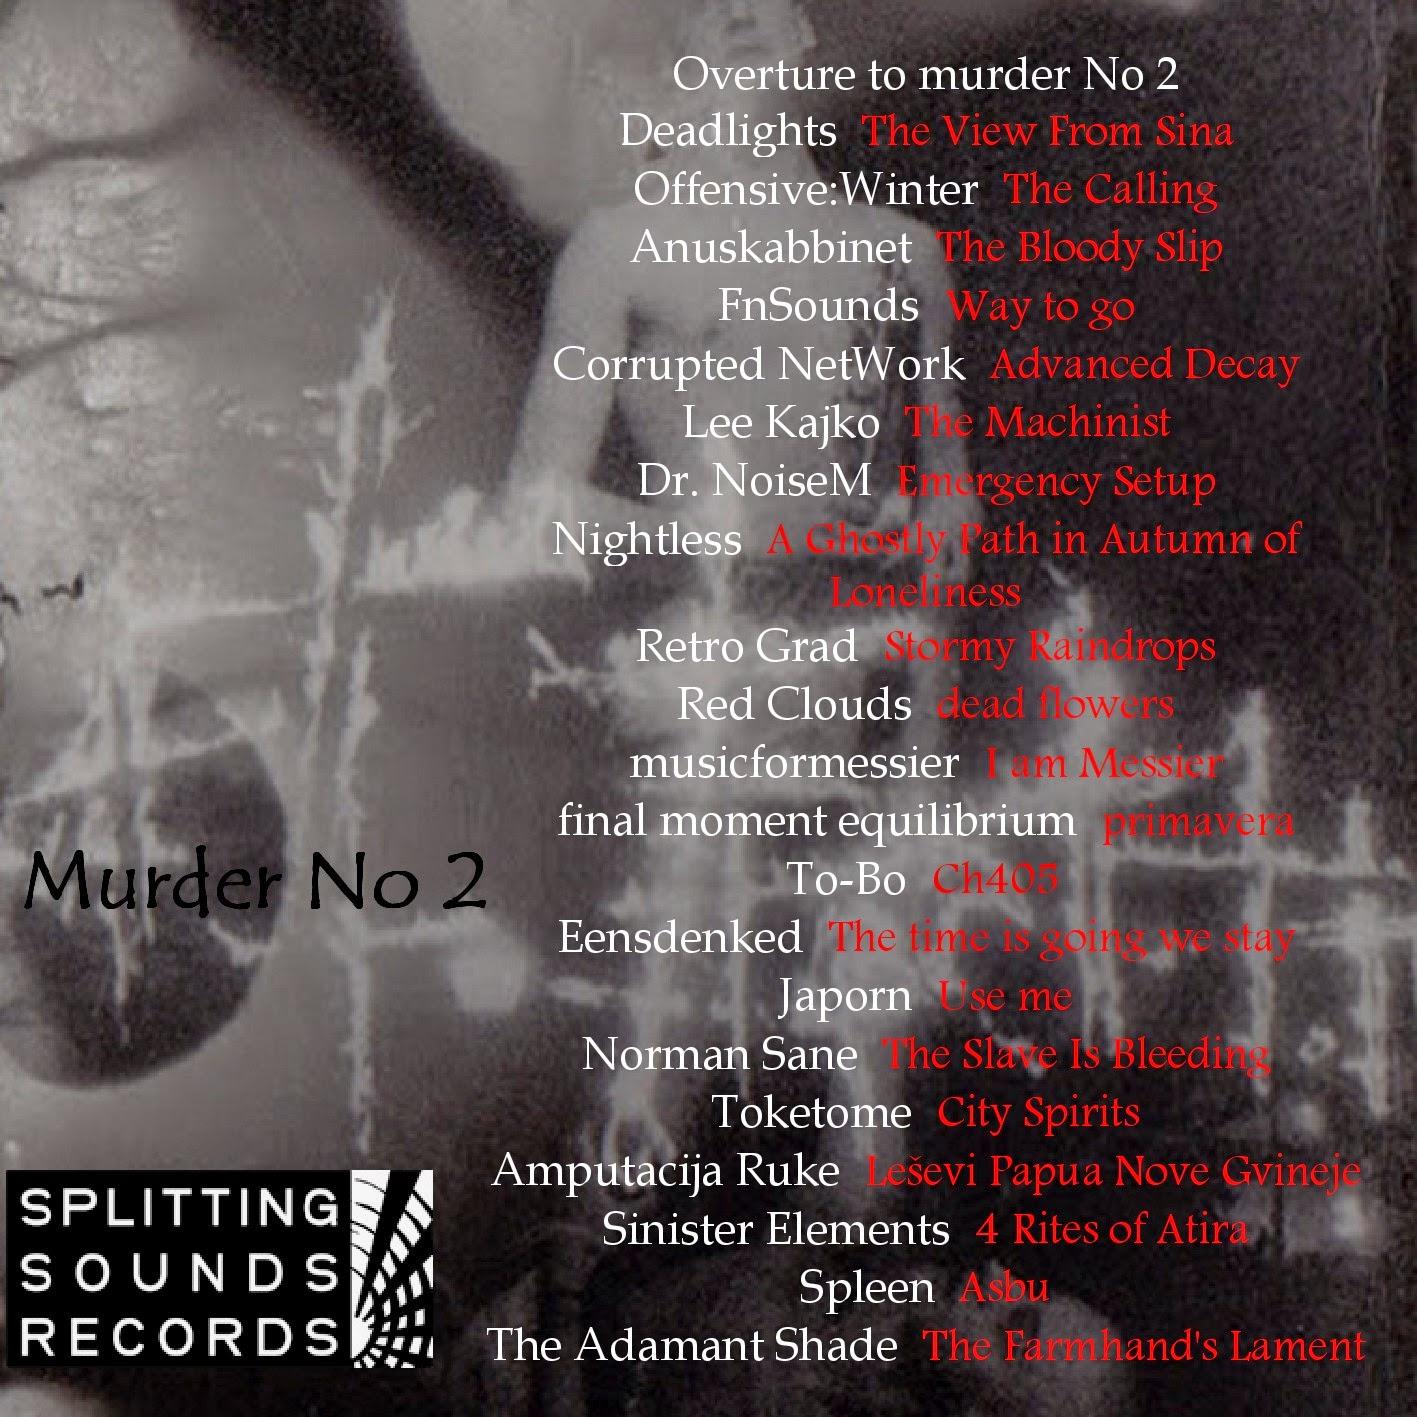 Chaosphere Vol. 2 - Sleepwalk To Murder (murder No 2) noise drone ambient postrock